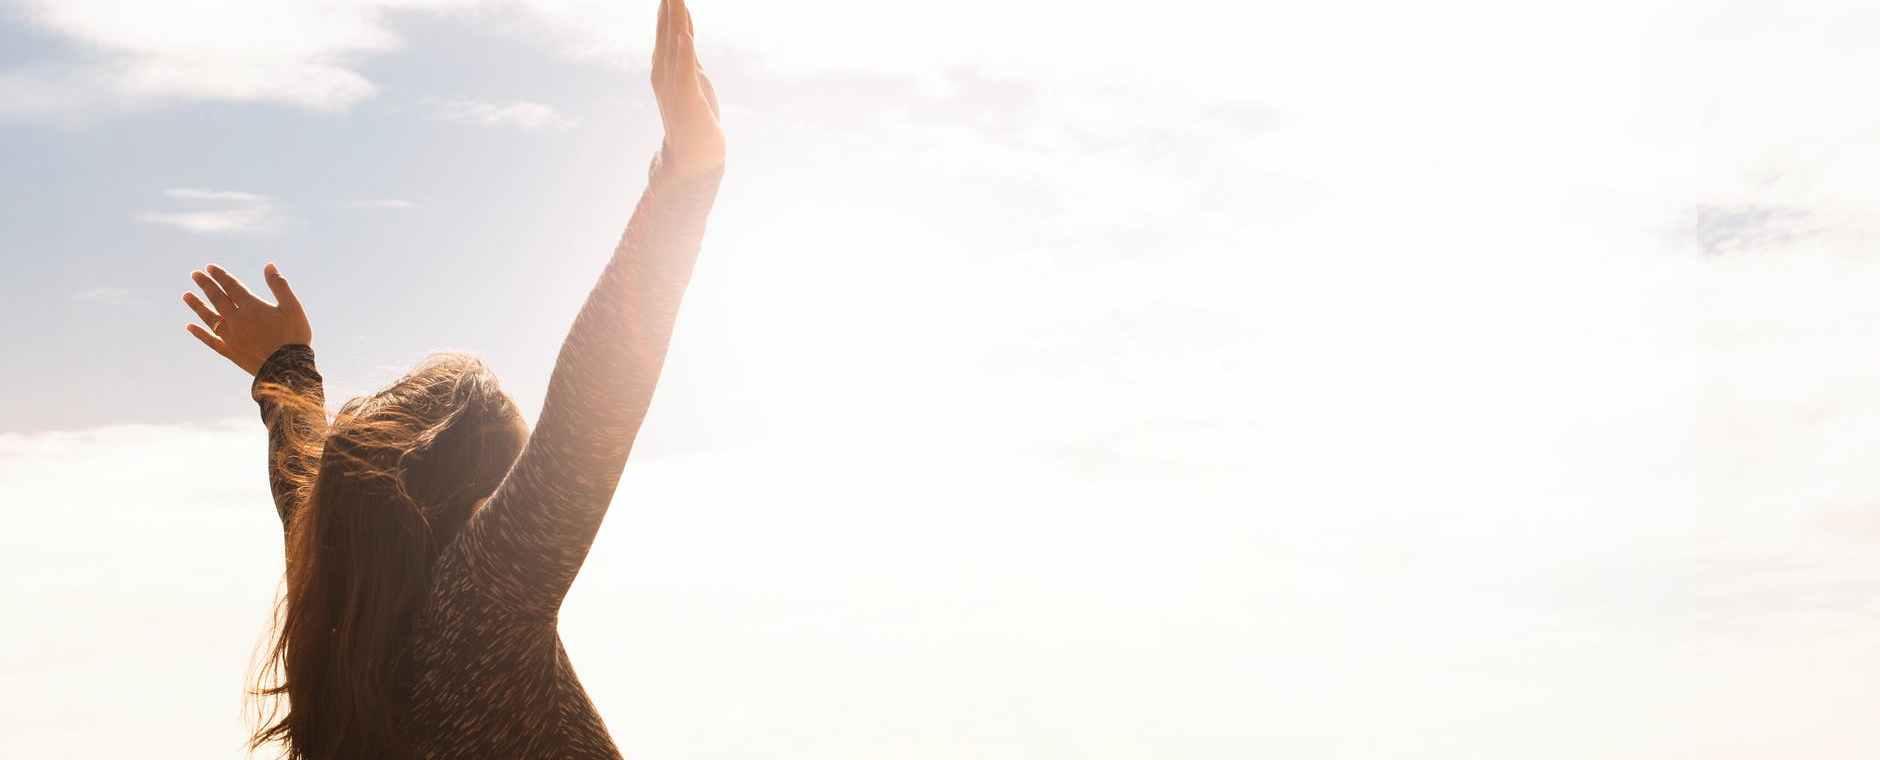 photo of woman raising both hands